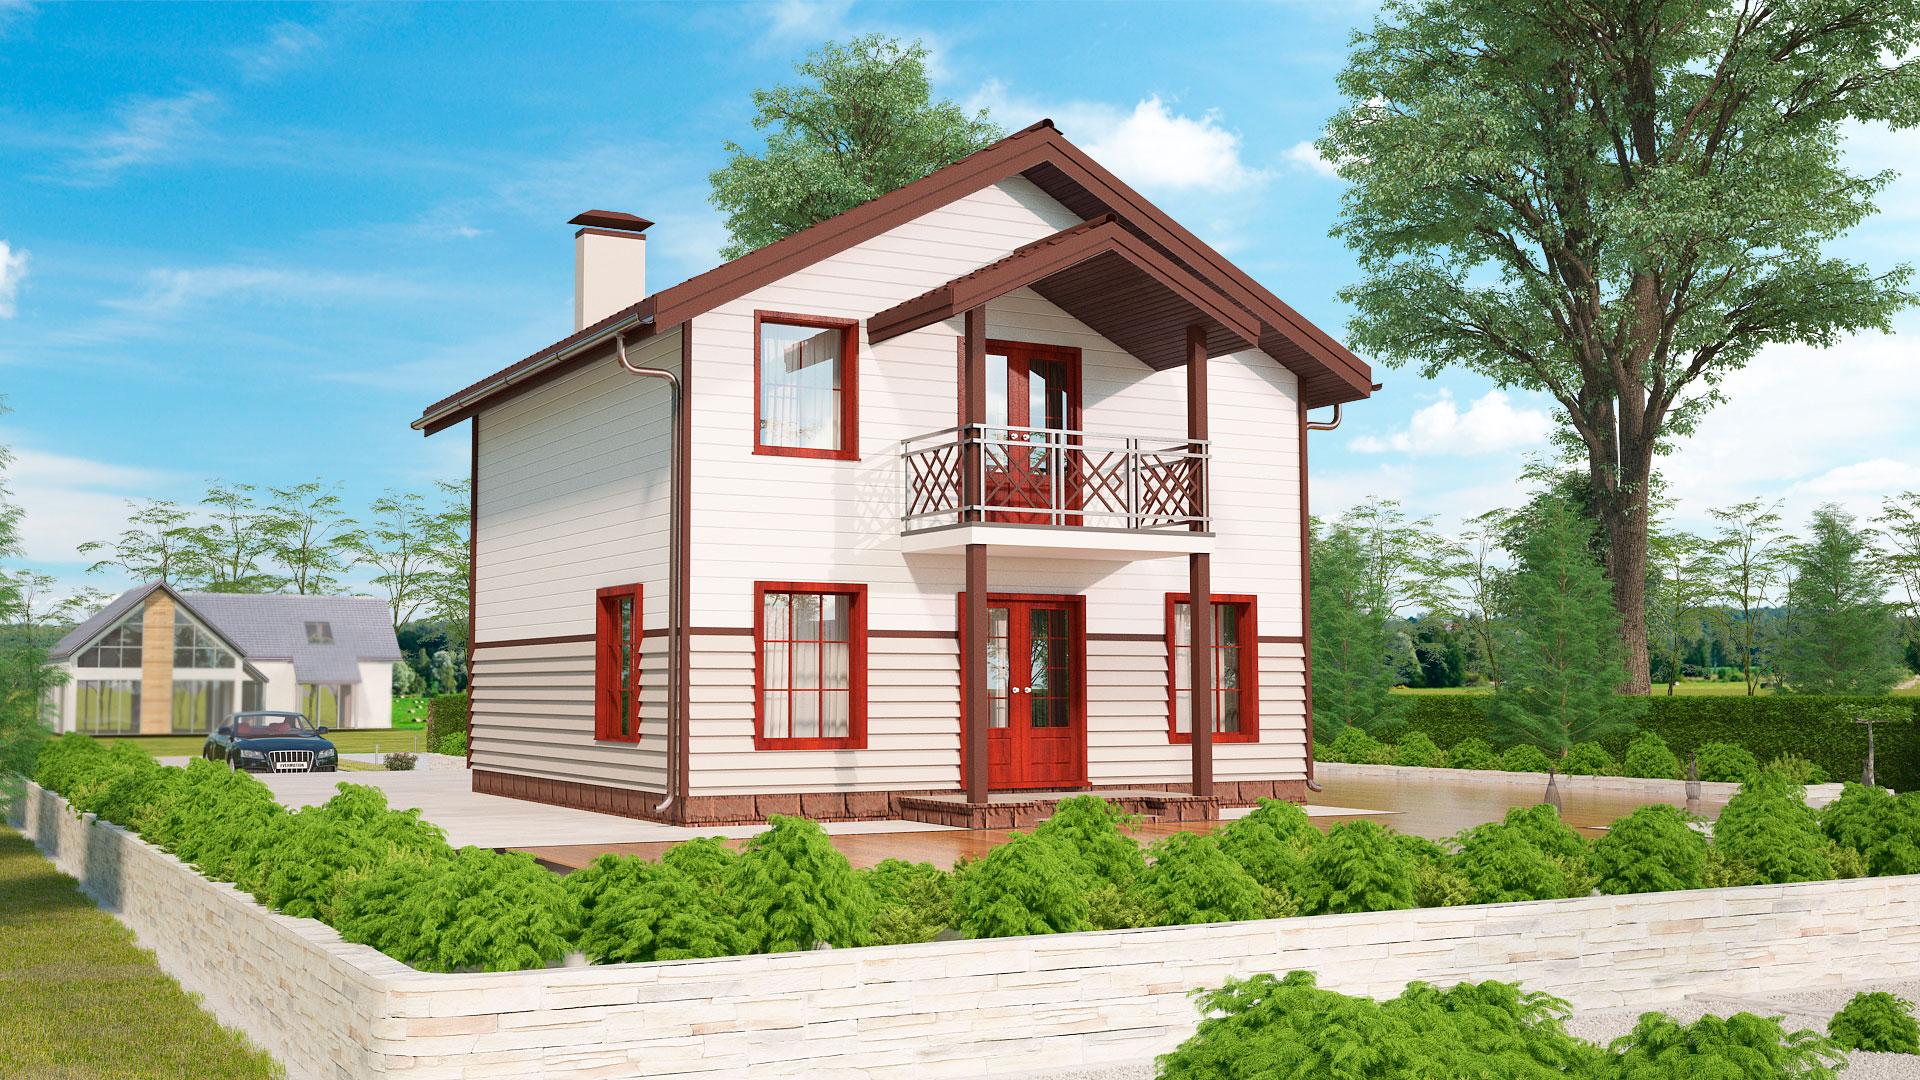 Задний фасад дома 8 на 8 двухэтажного, проект БЭНПАН МС-108.